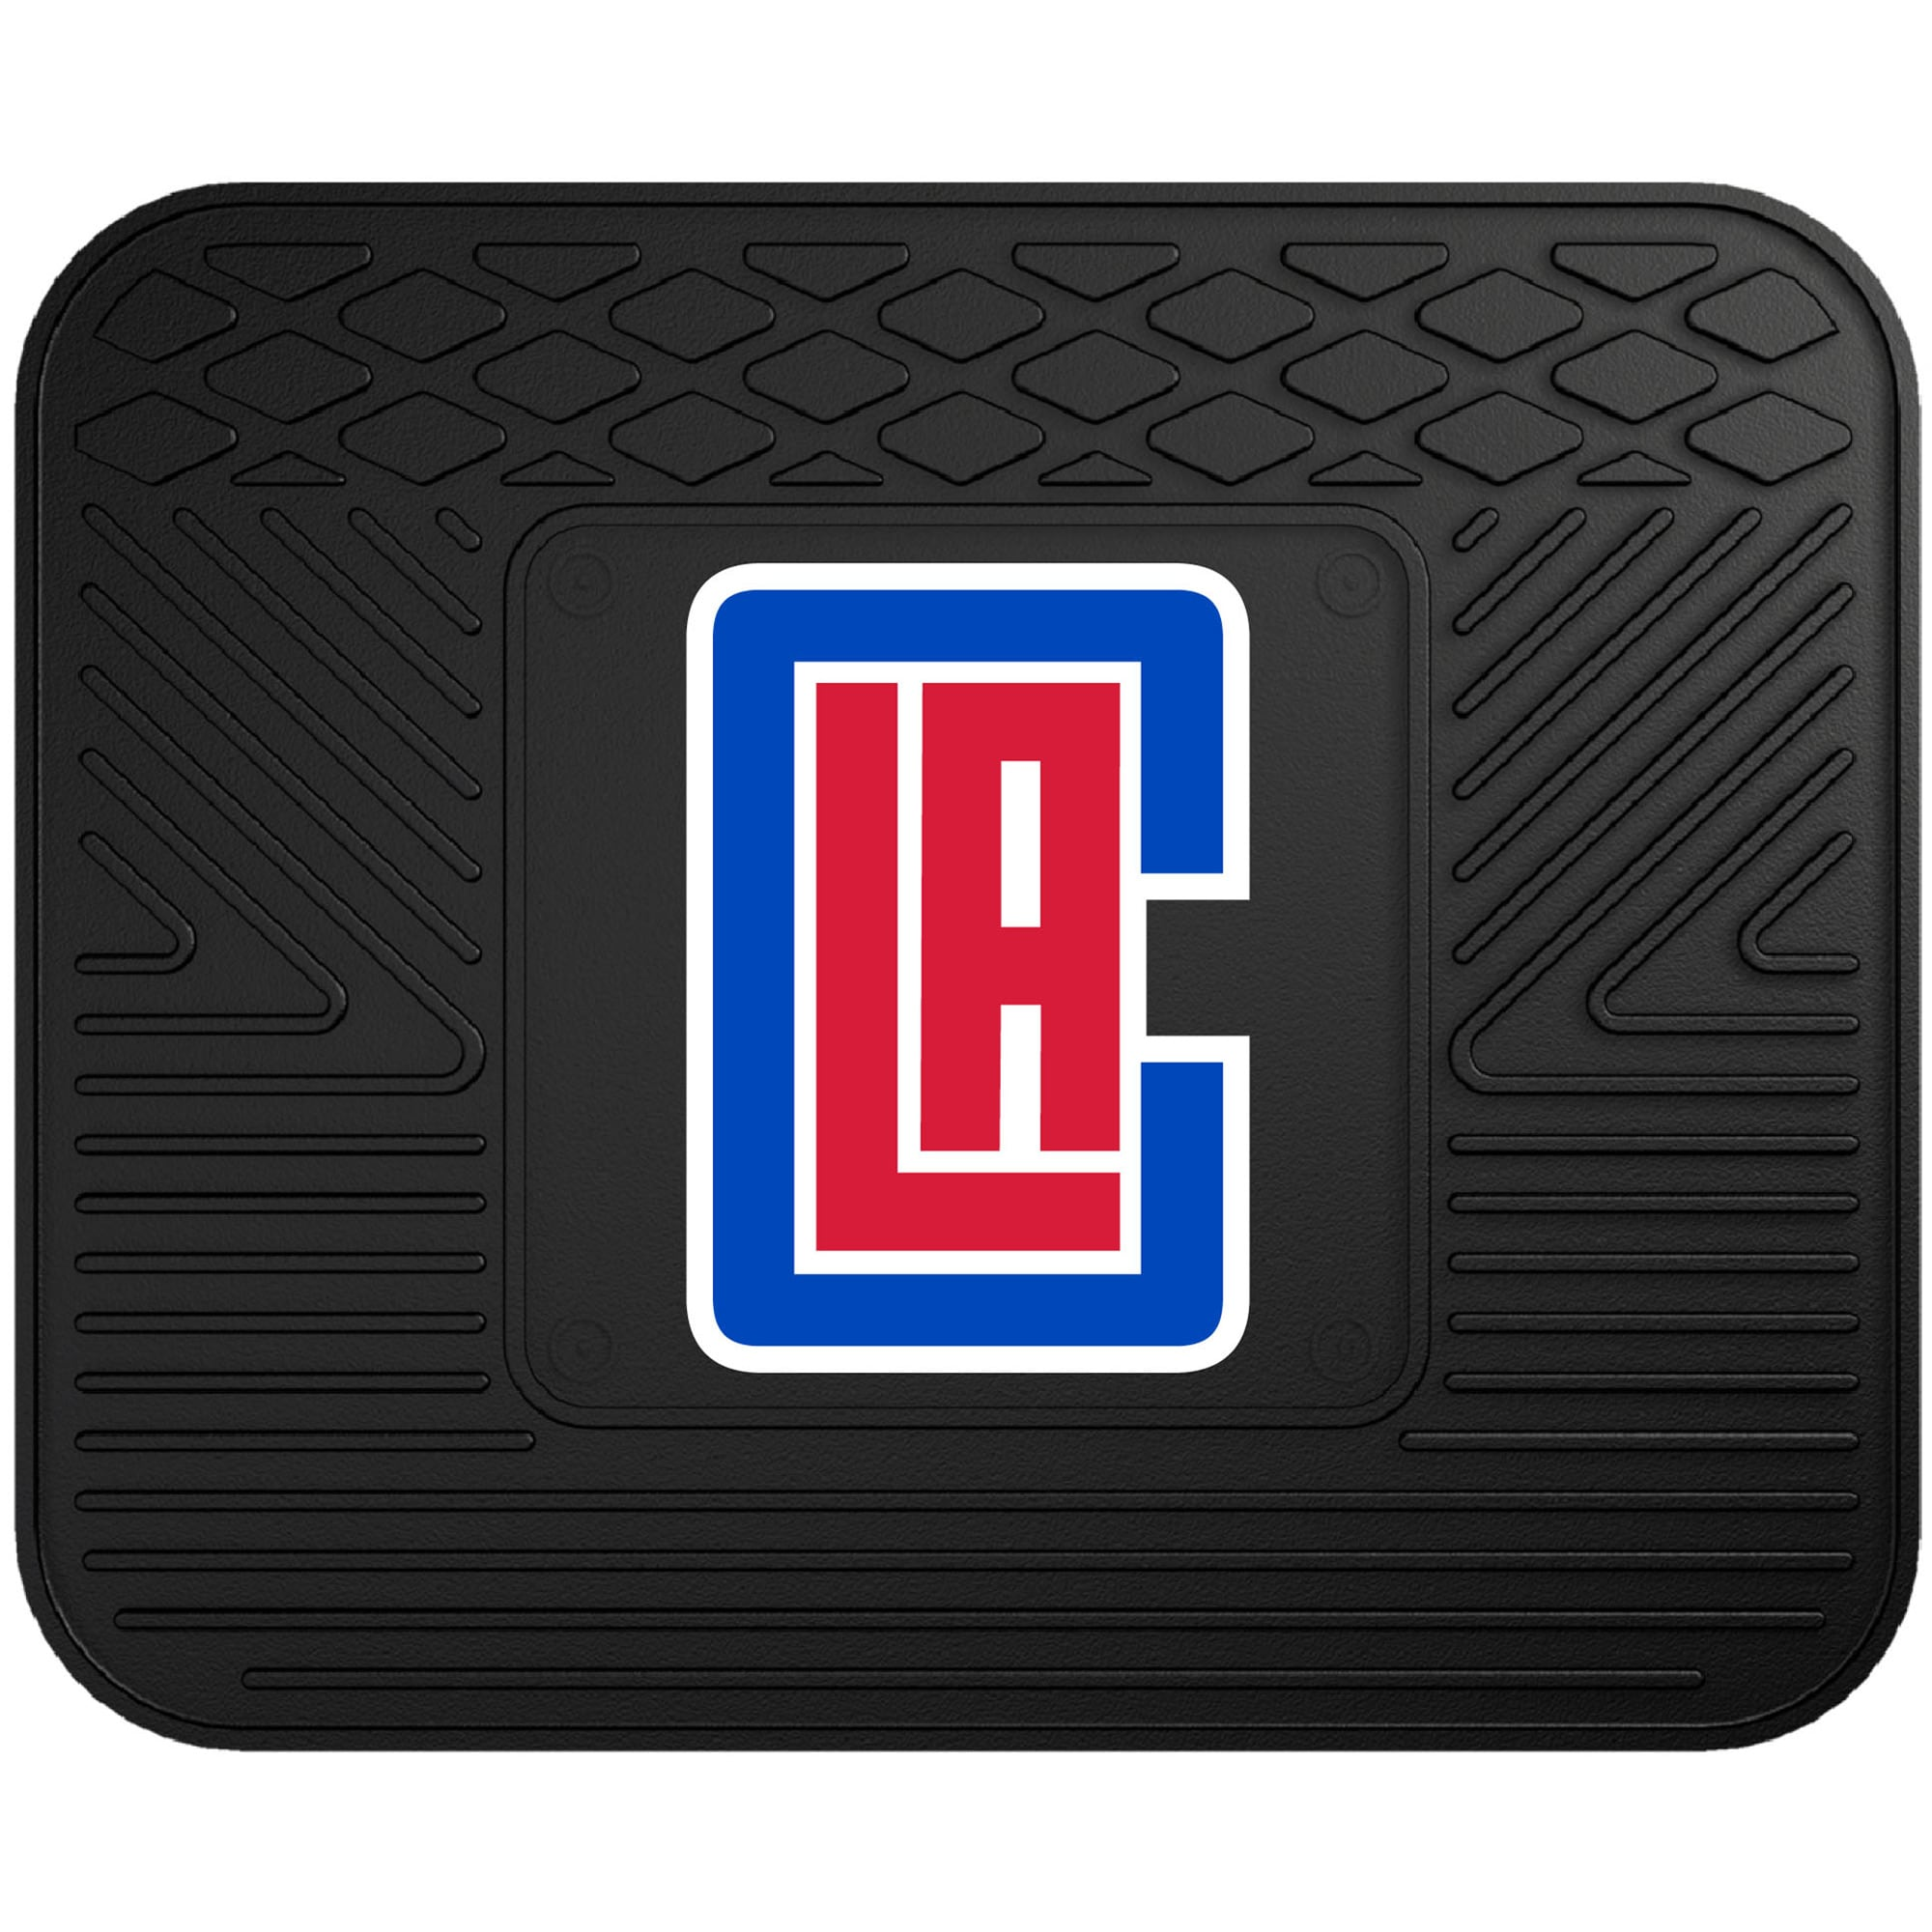 "LA Clippers 17"" x 14"" Utility Mat"